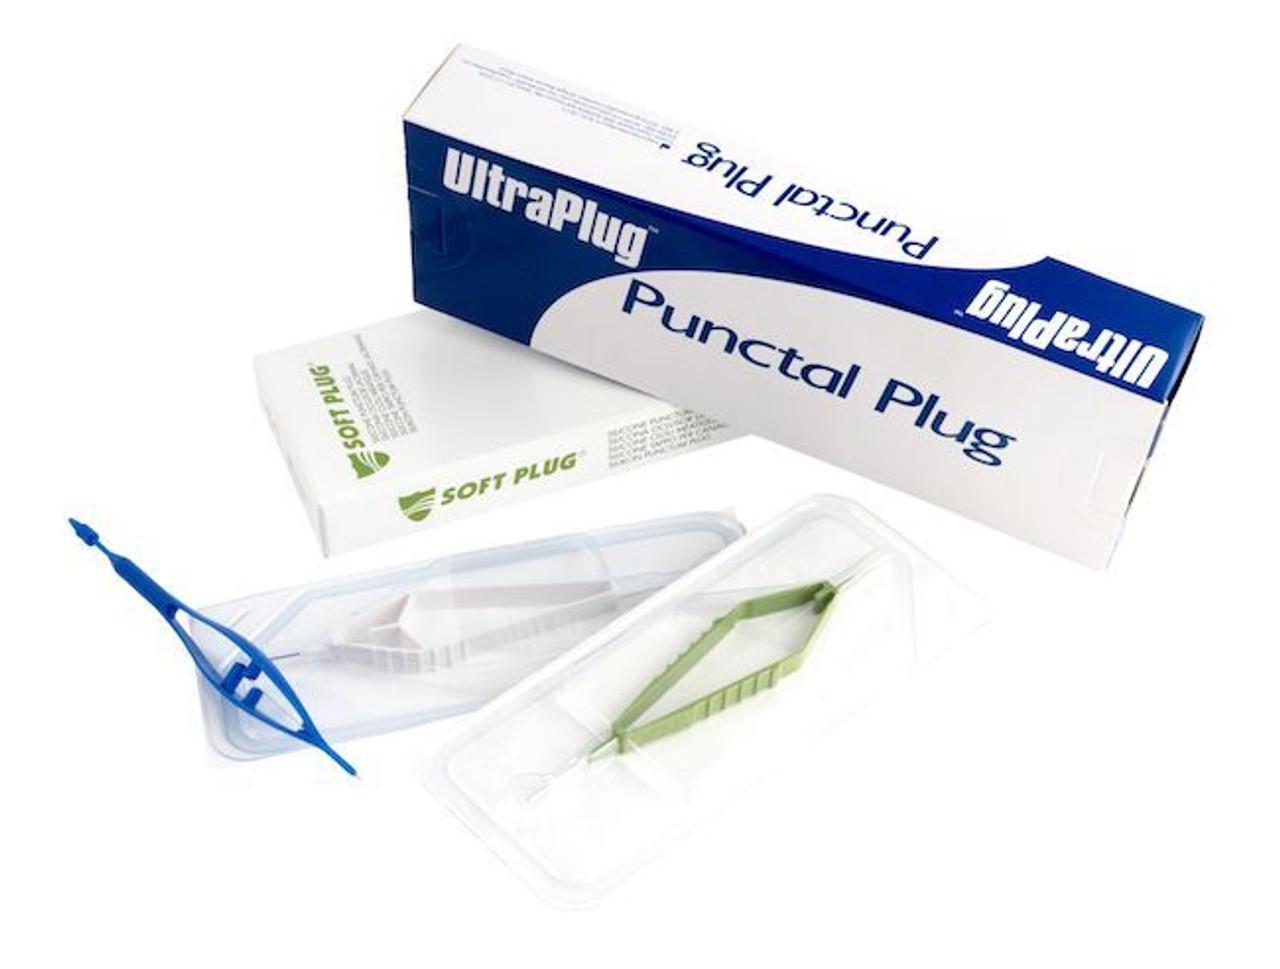 Punctal Plugs